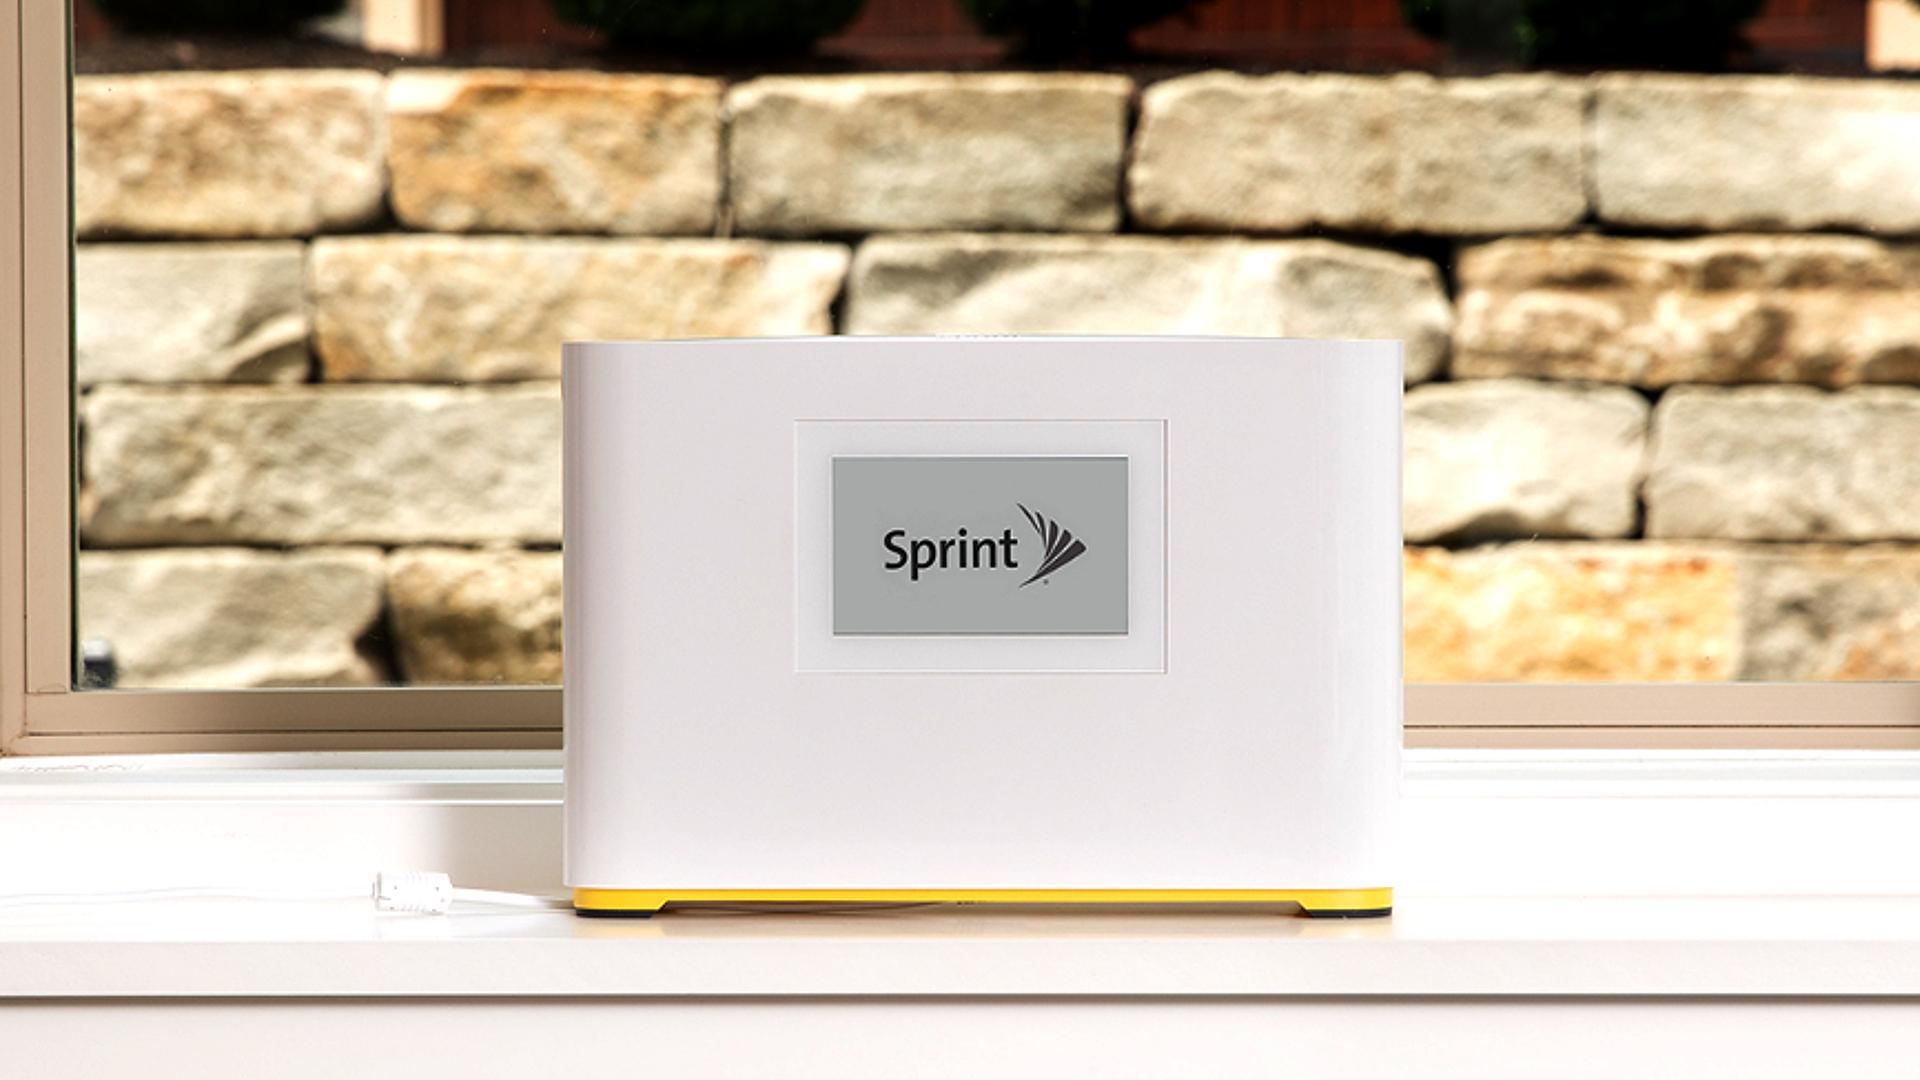 Sprint 5g box